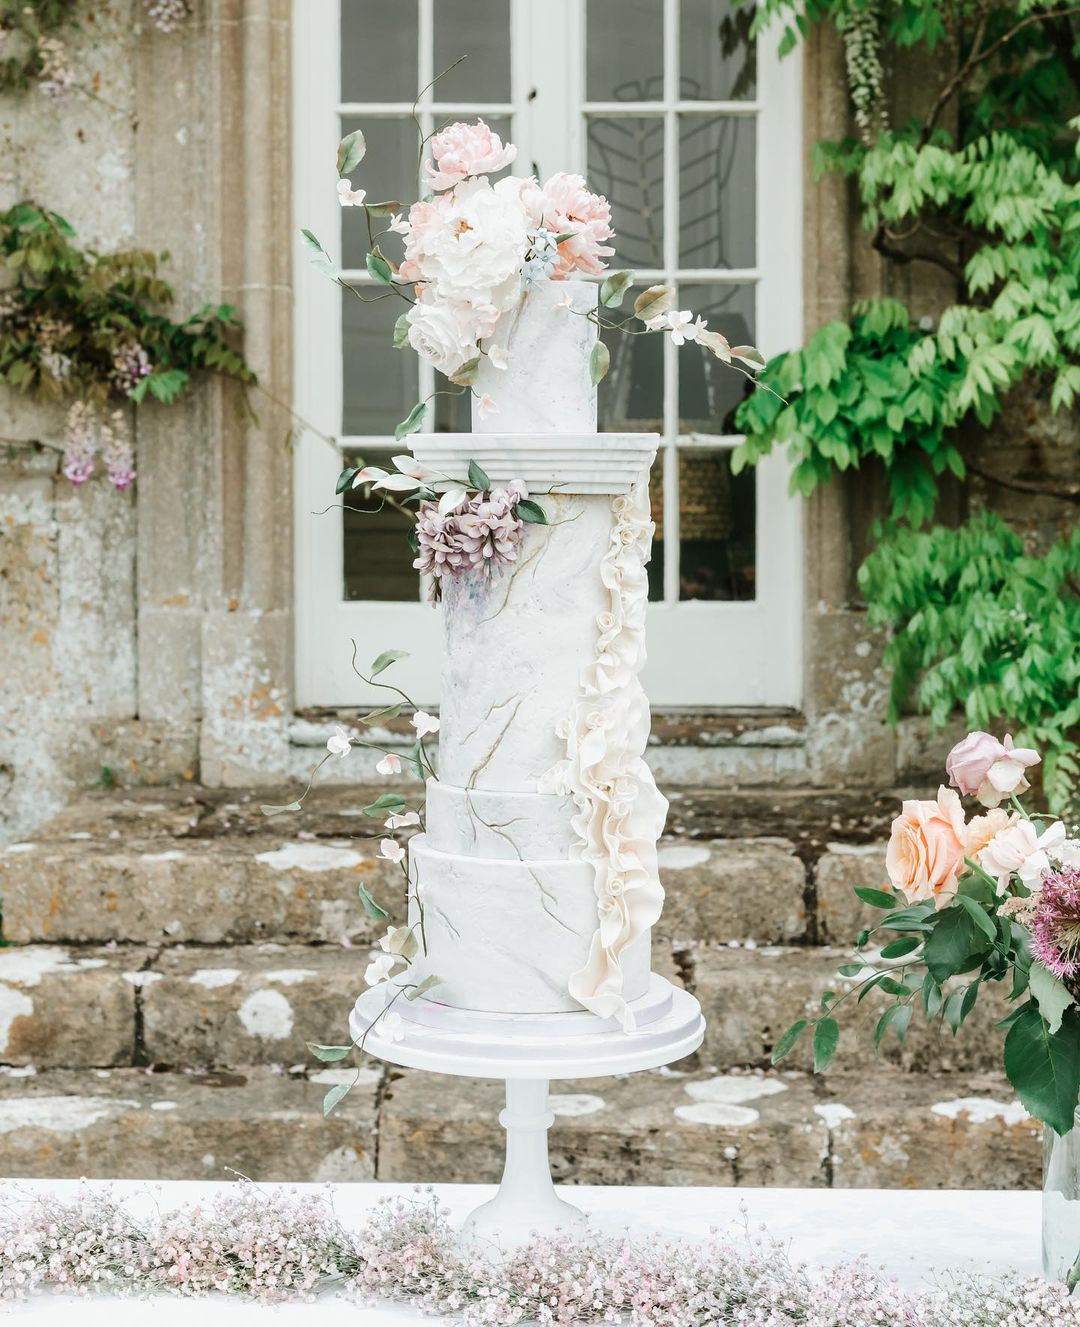 Luxury Wedding Cake at Hamswell House